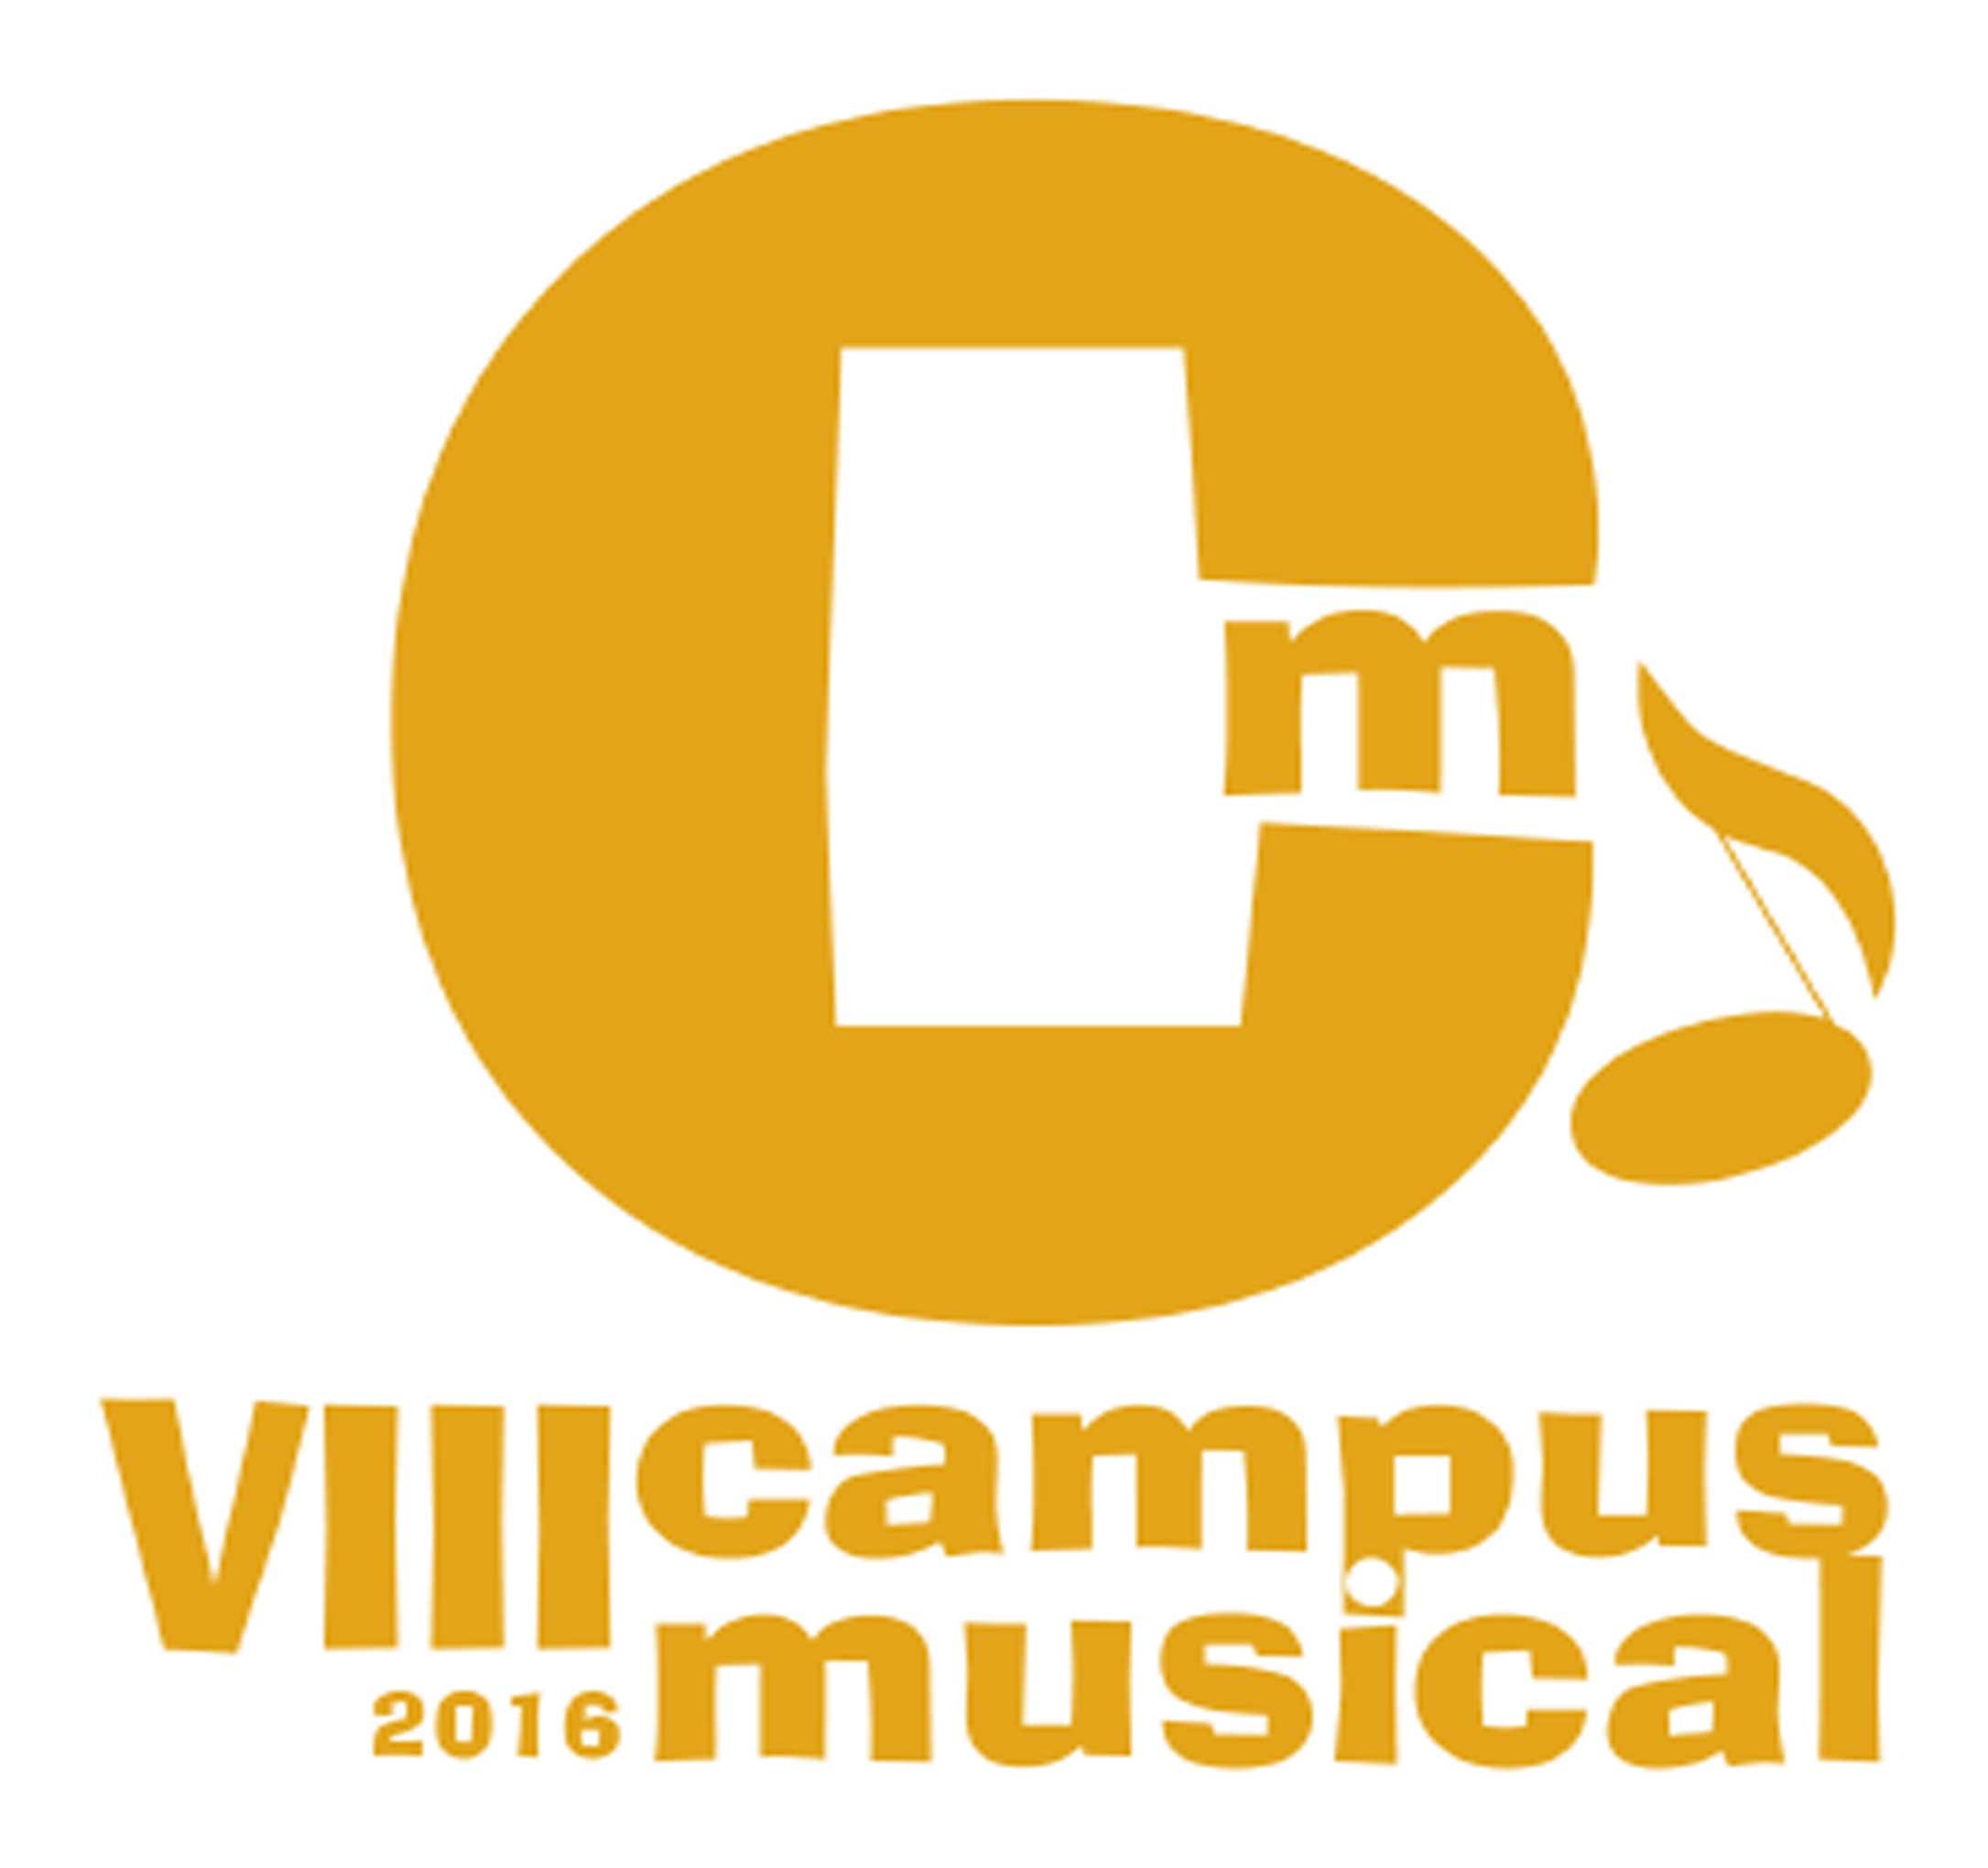 VIII-Campus-Musical-FGBMP.jpg